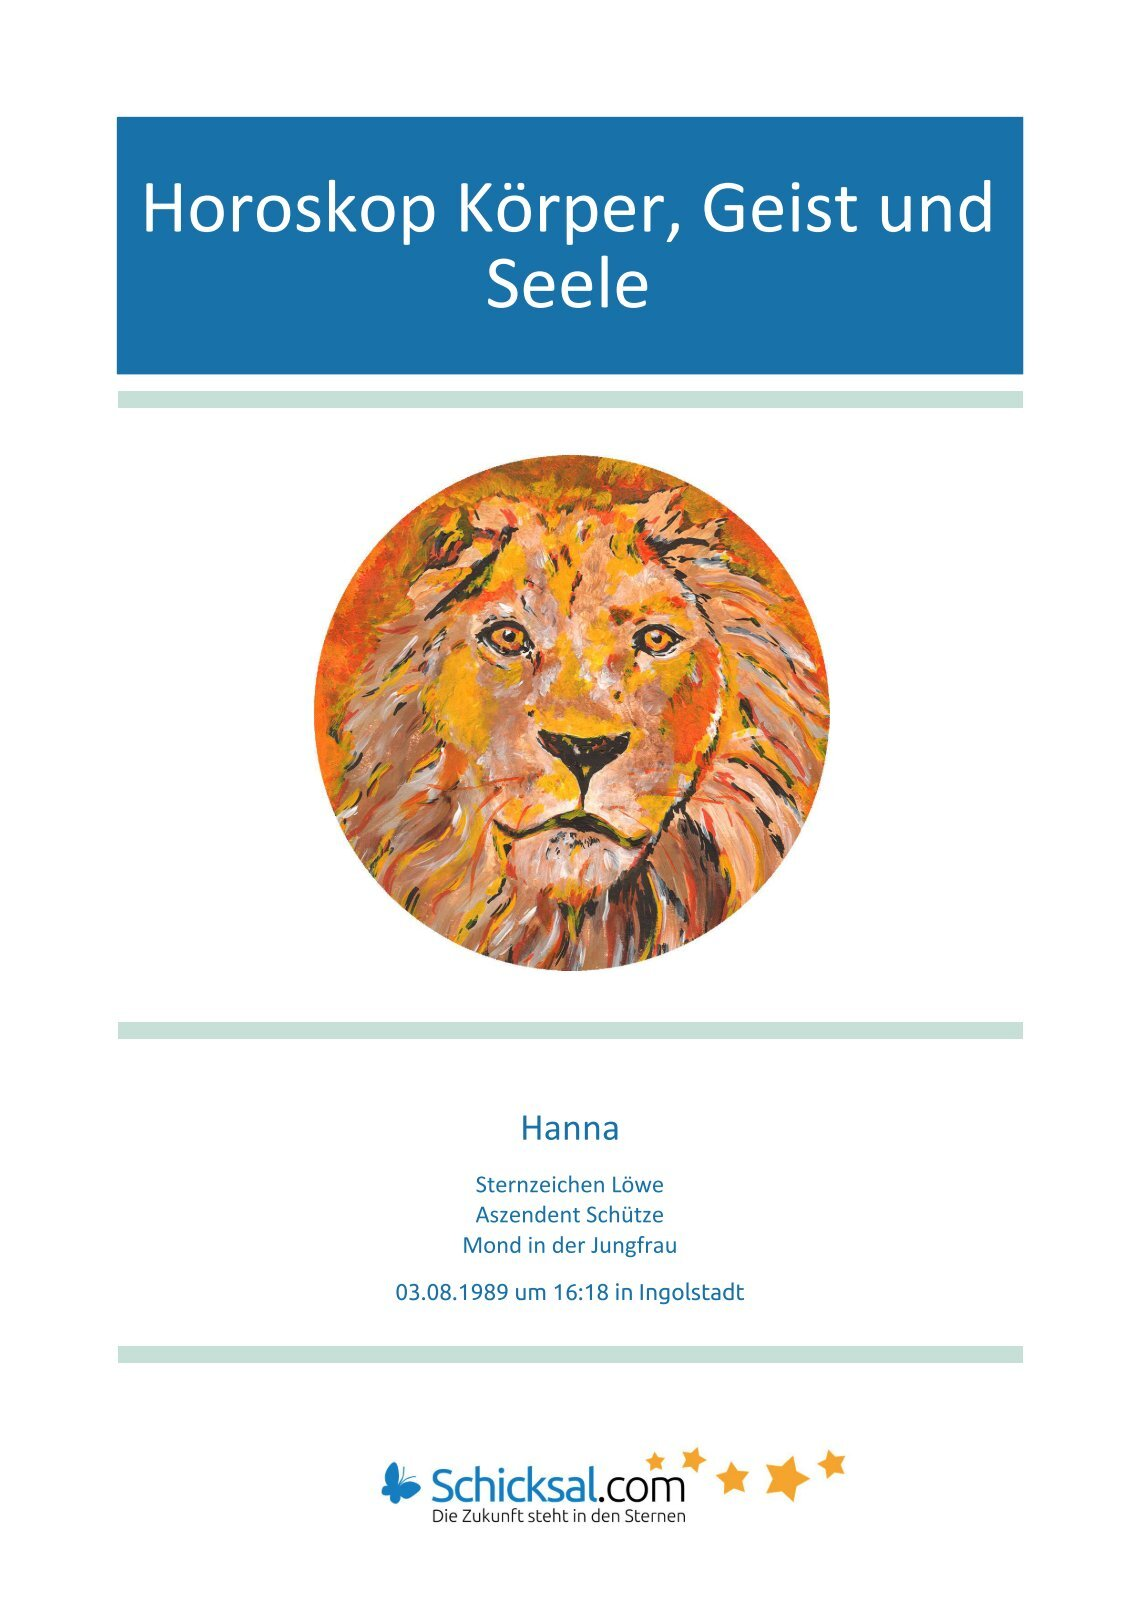 Horoskop Körper, Geist und Seele Hanna